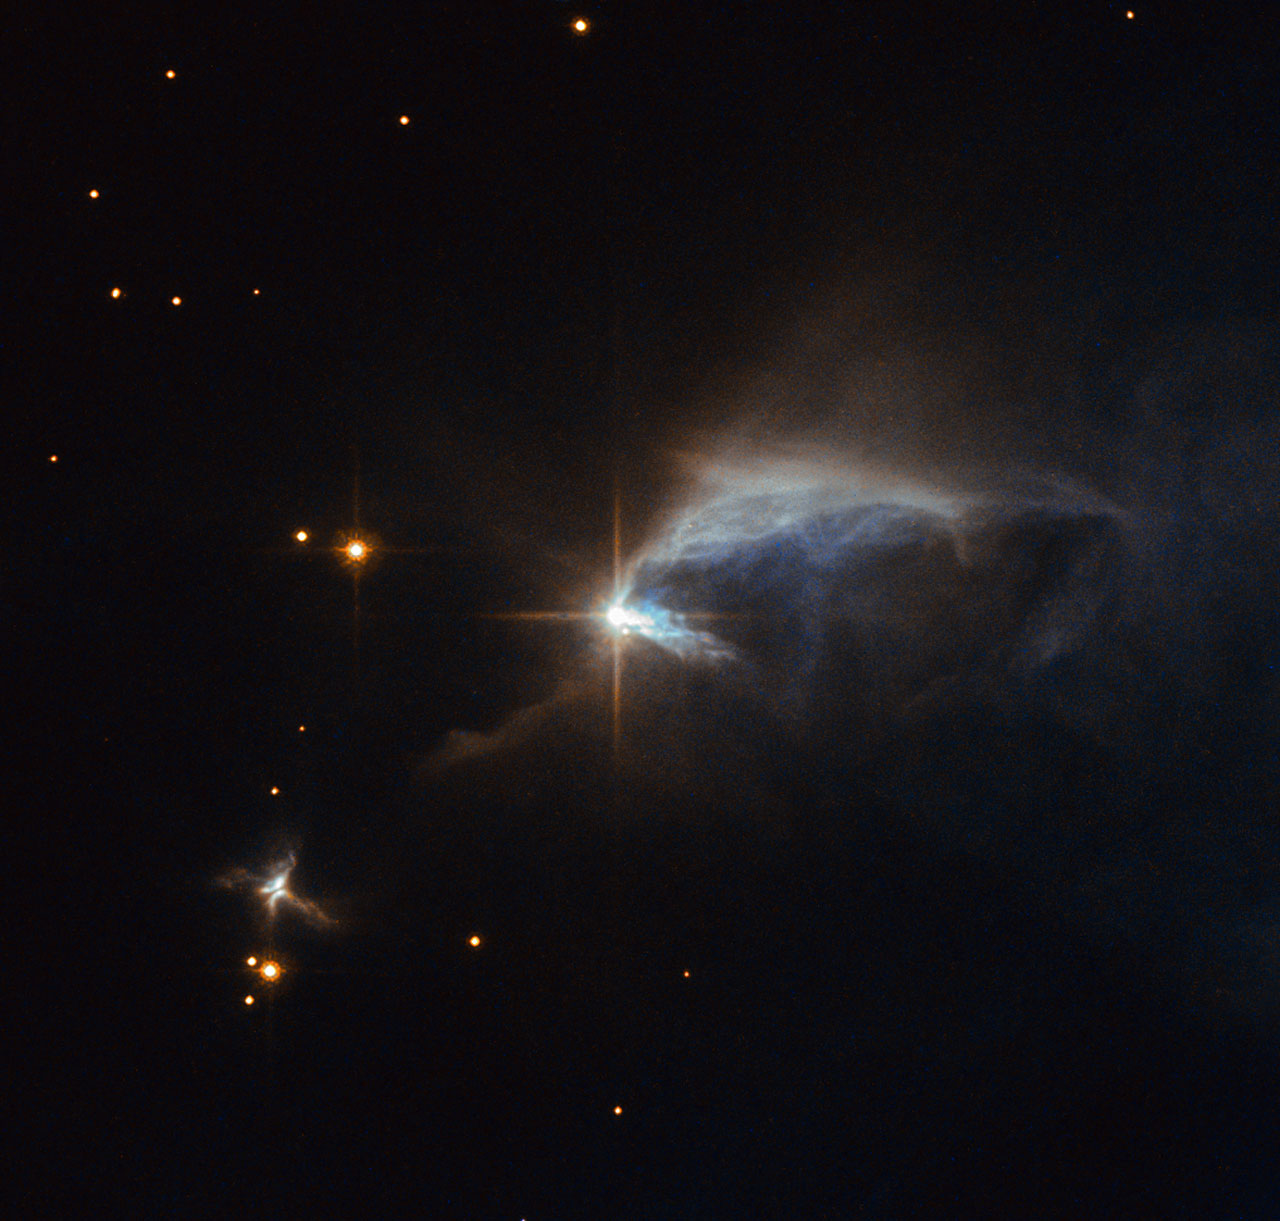 Nebula by Starlight